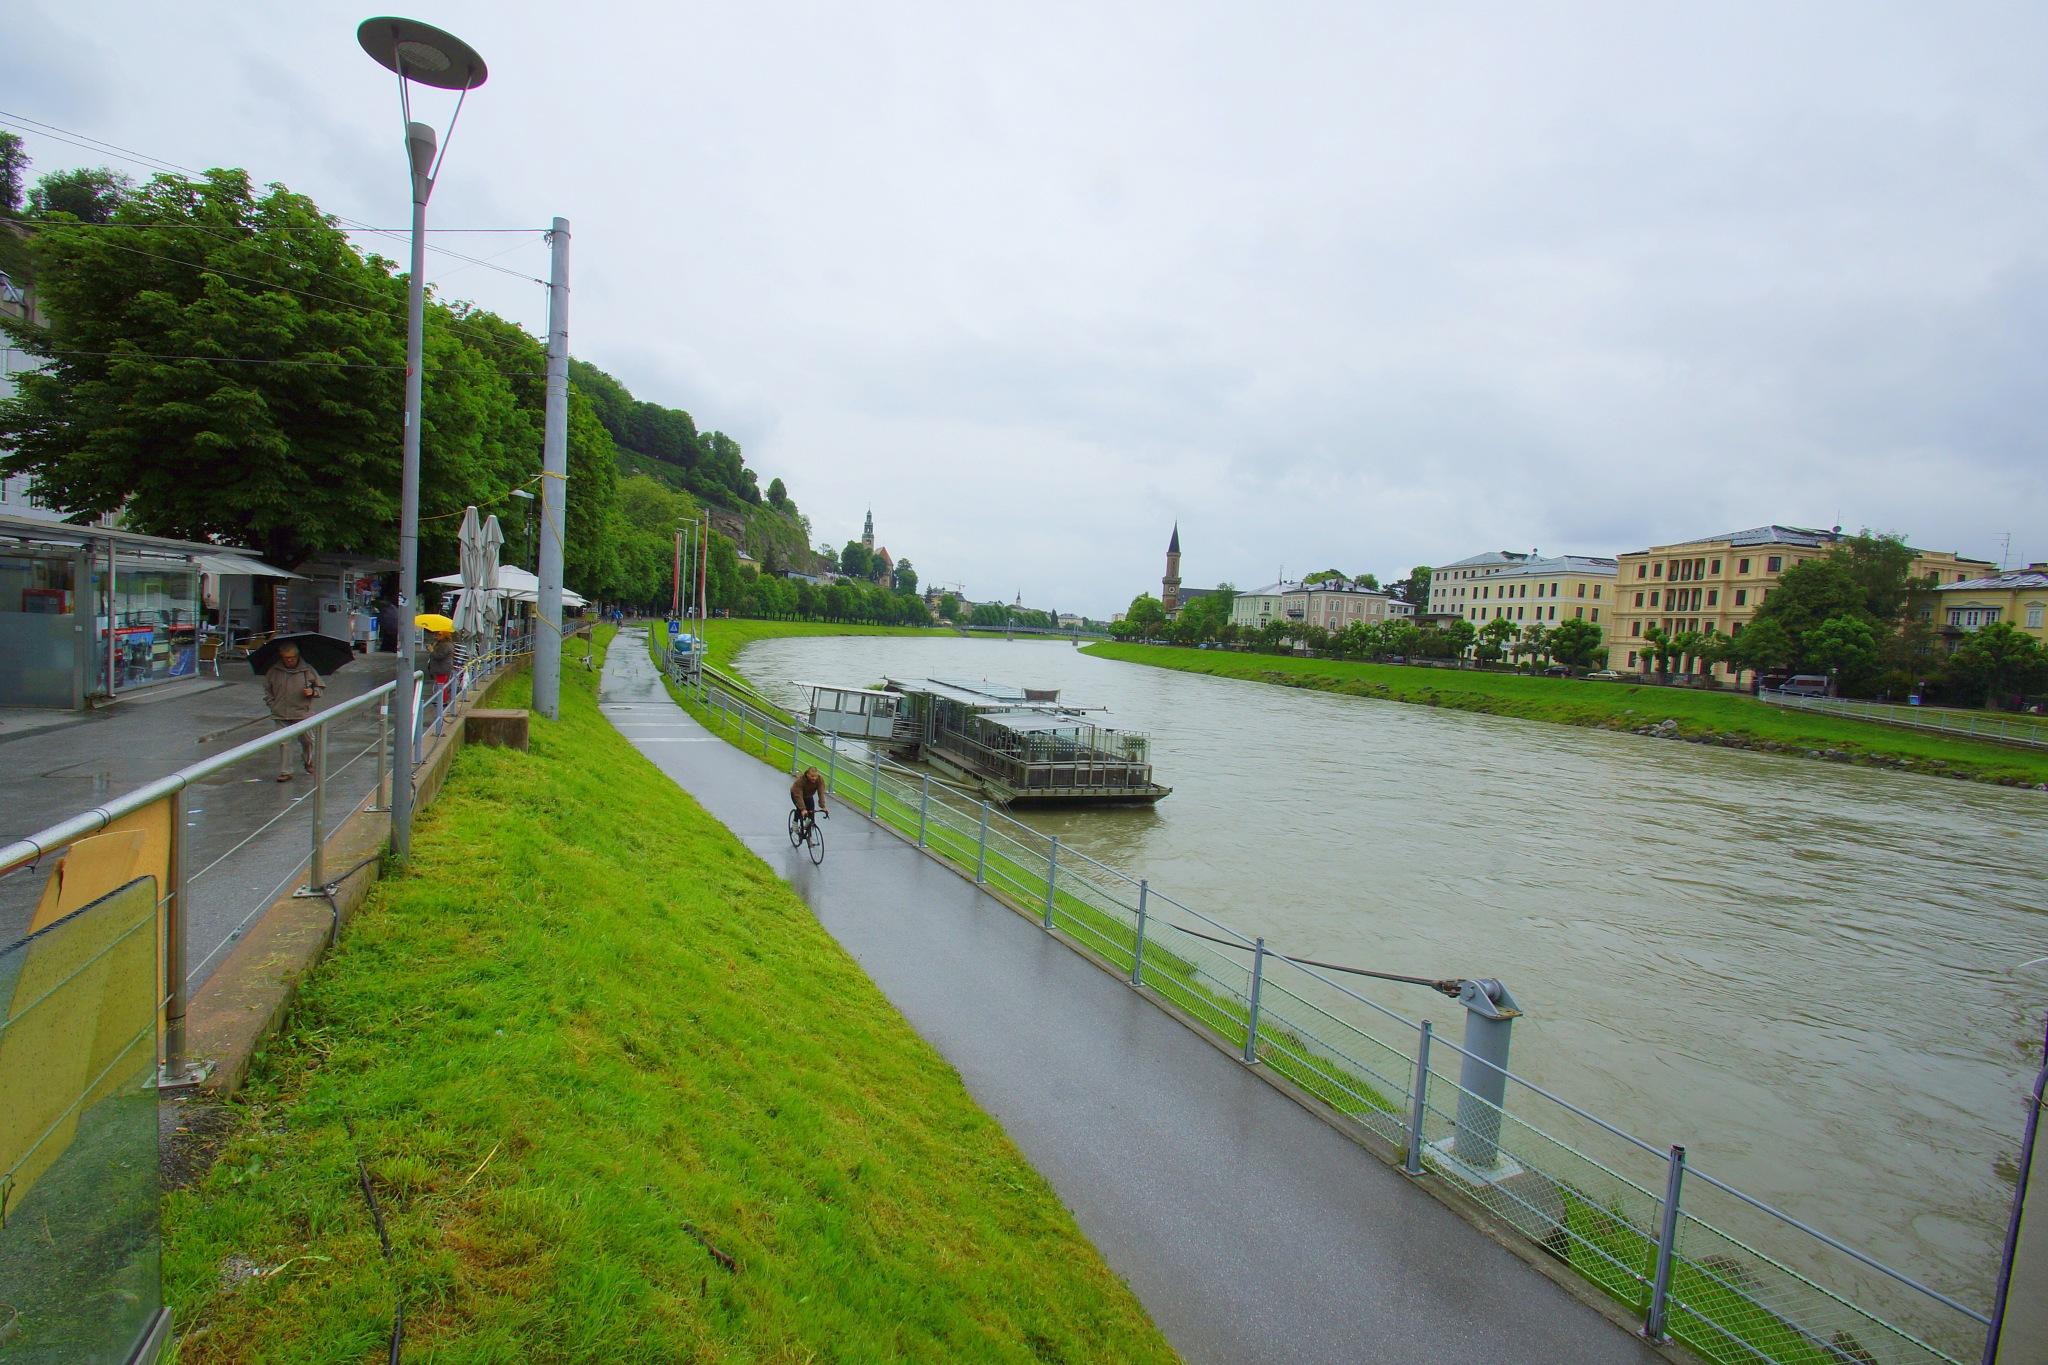 Salzach river  by MEHMET